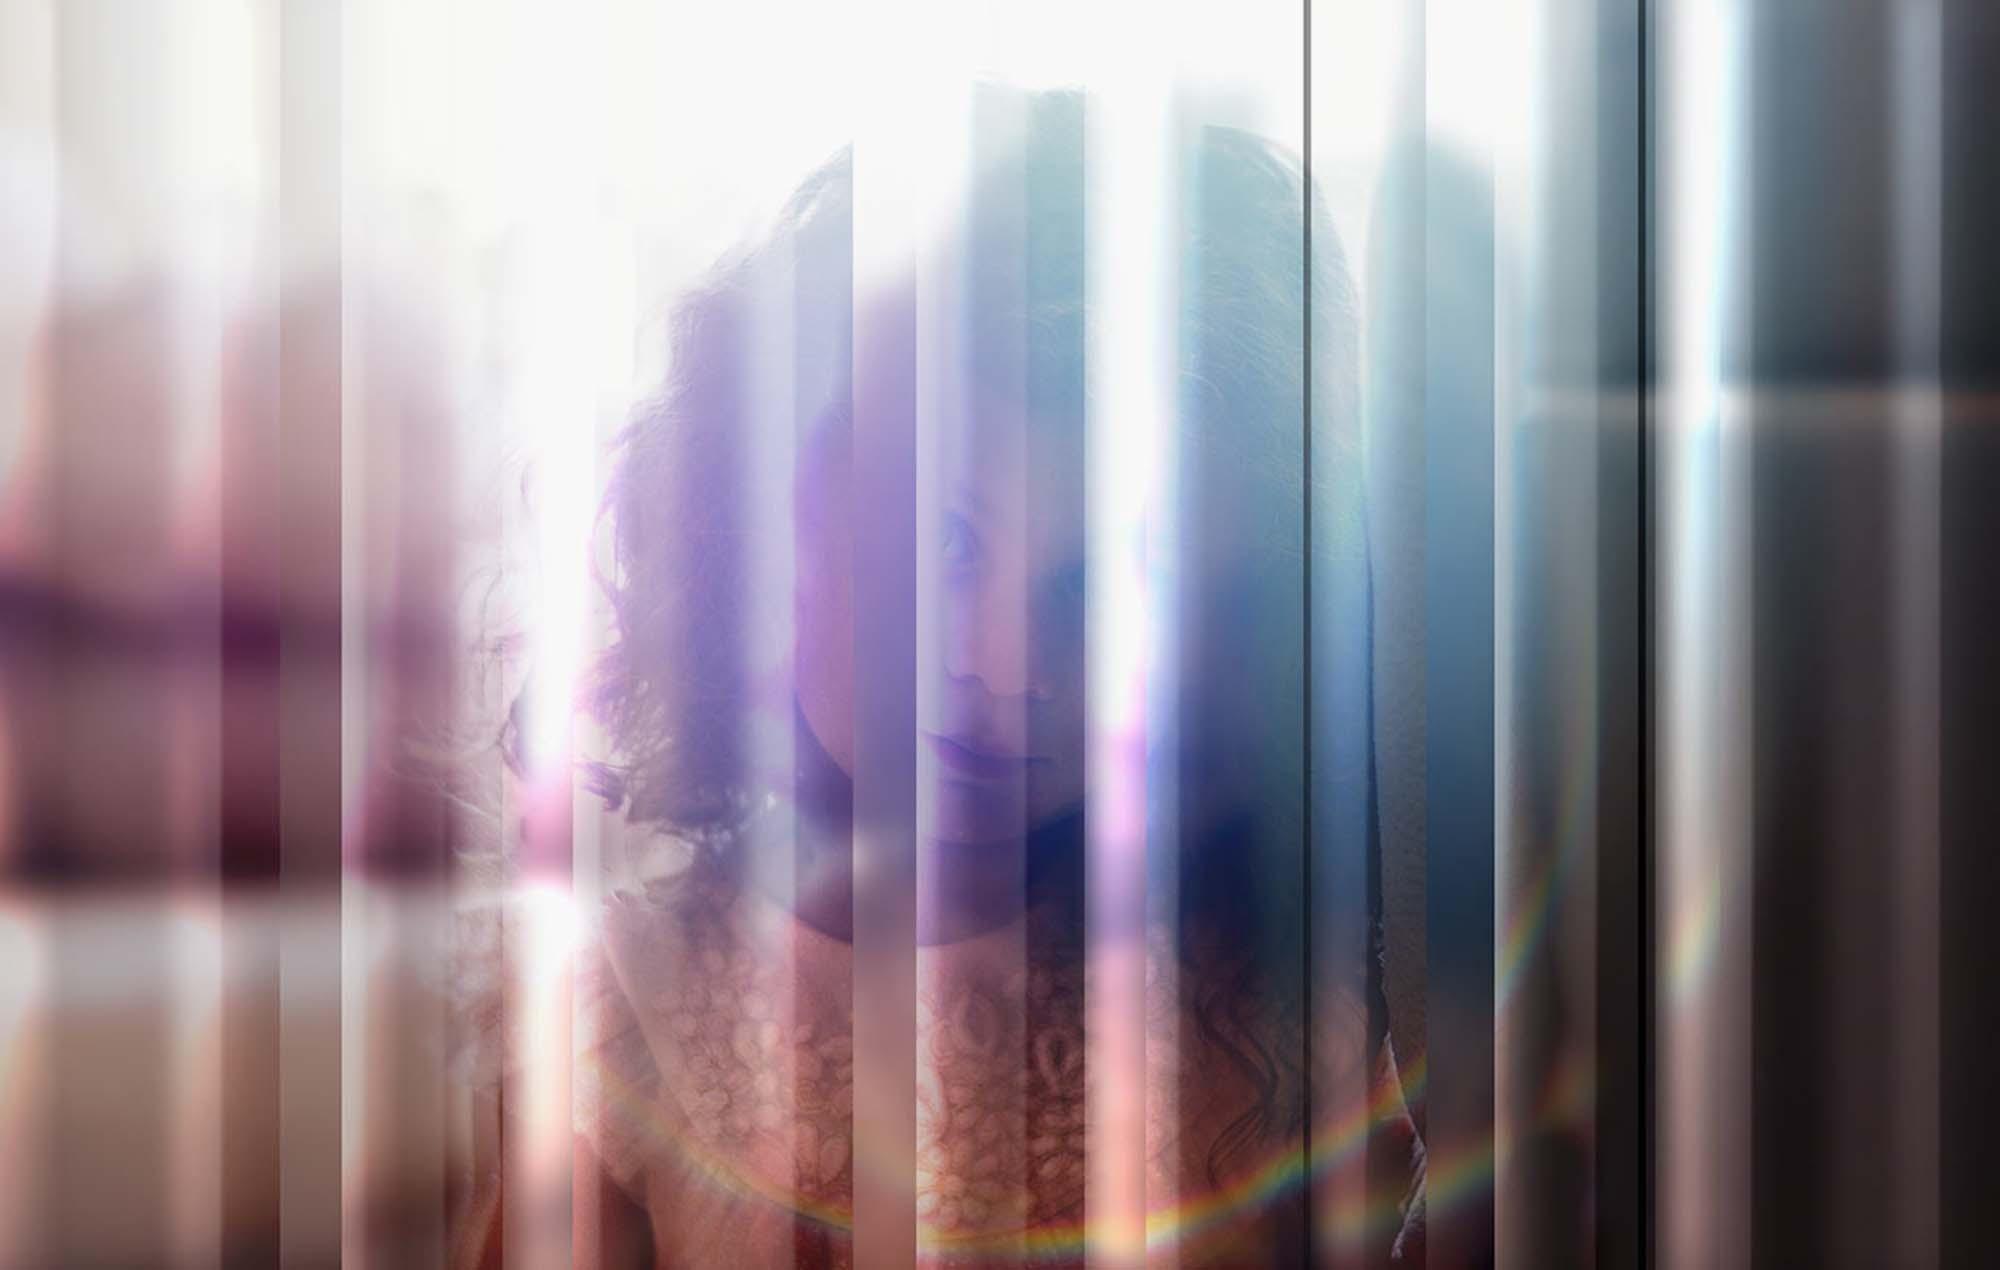 Cinematic Prism Photoshop Action